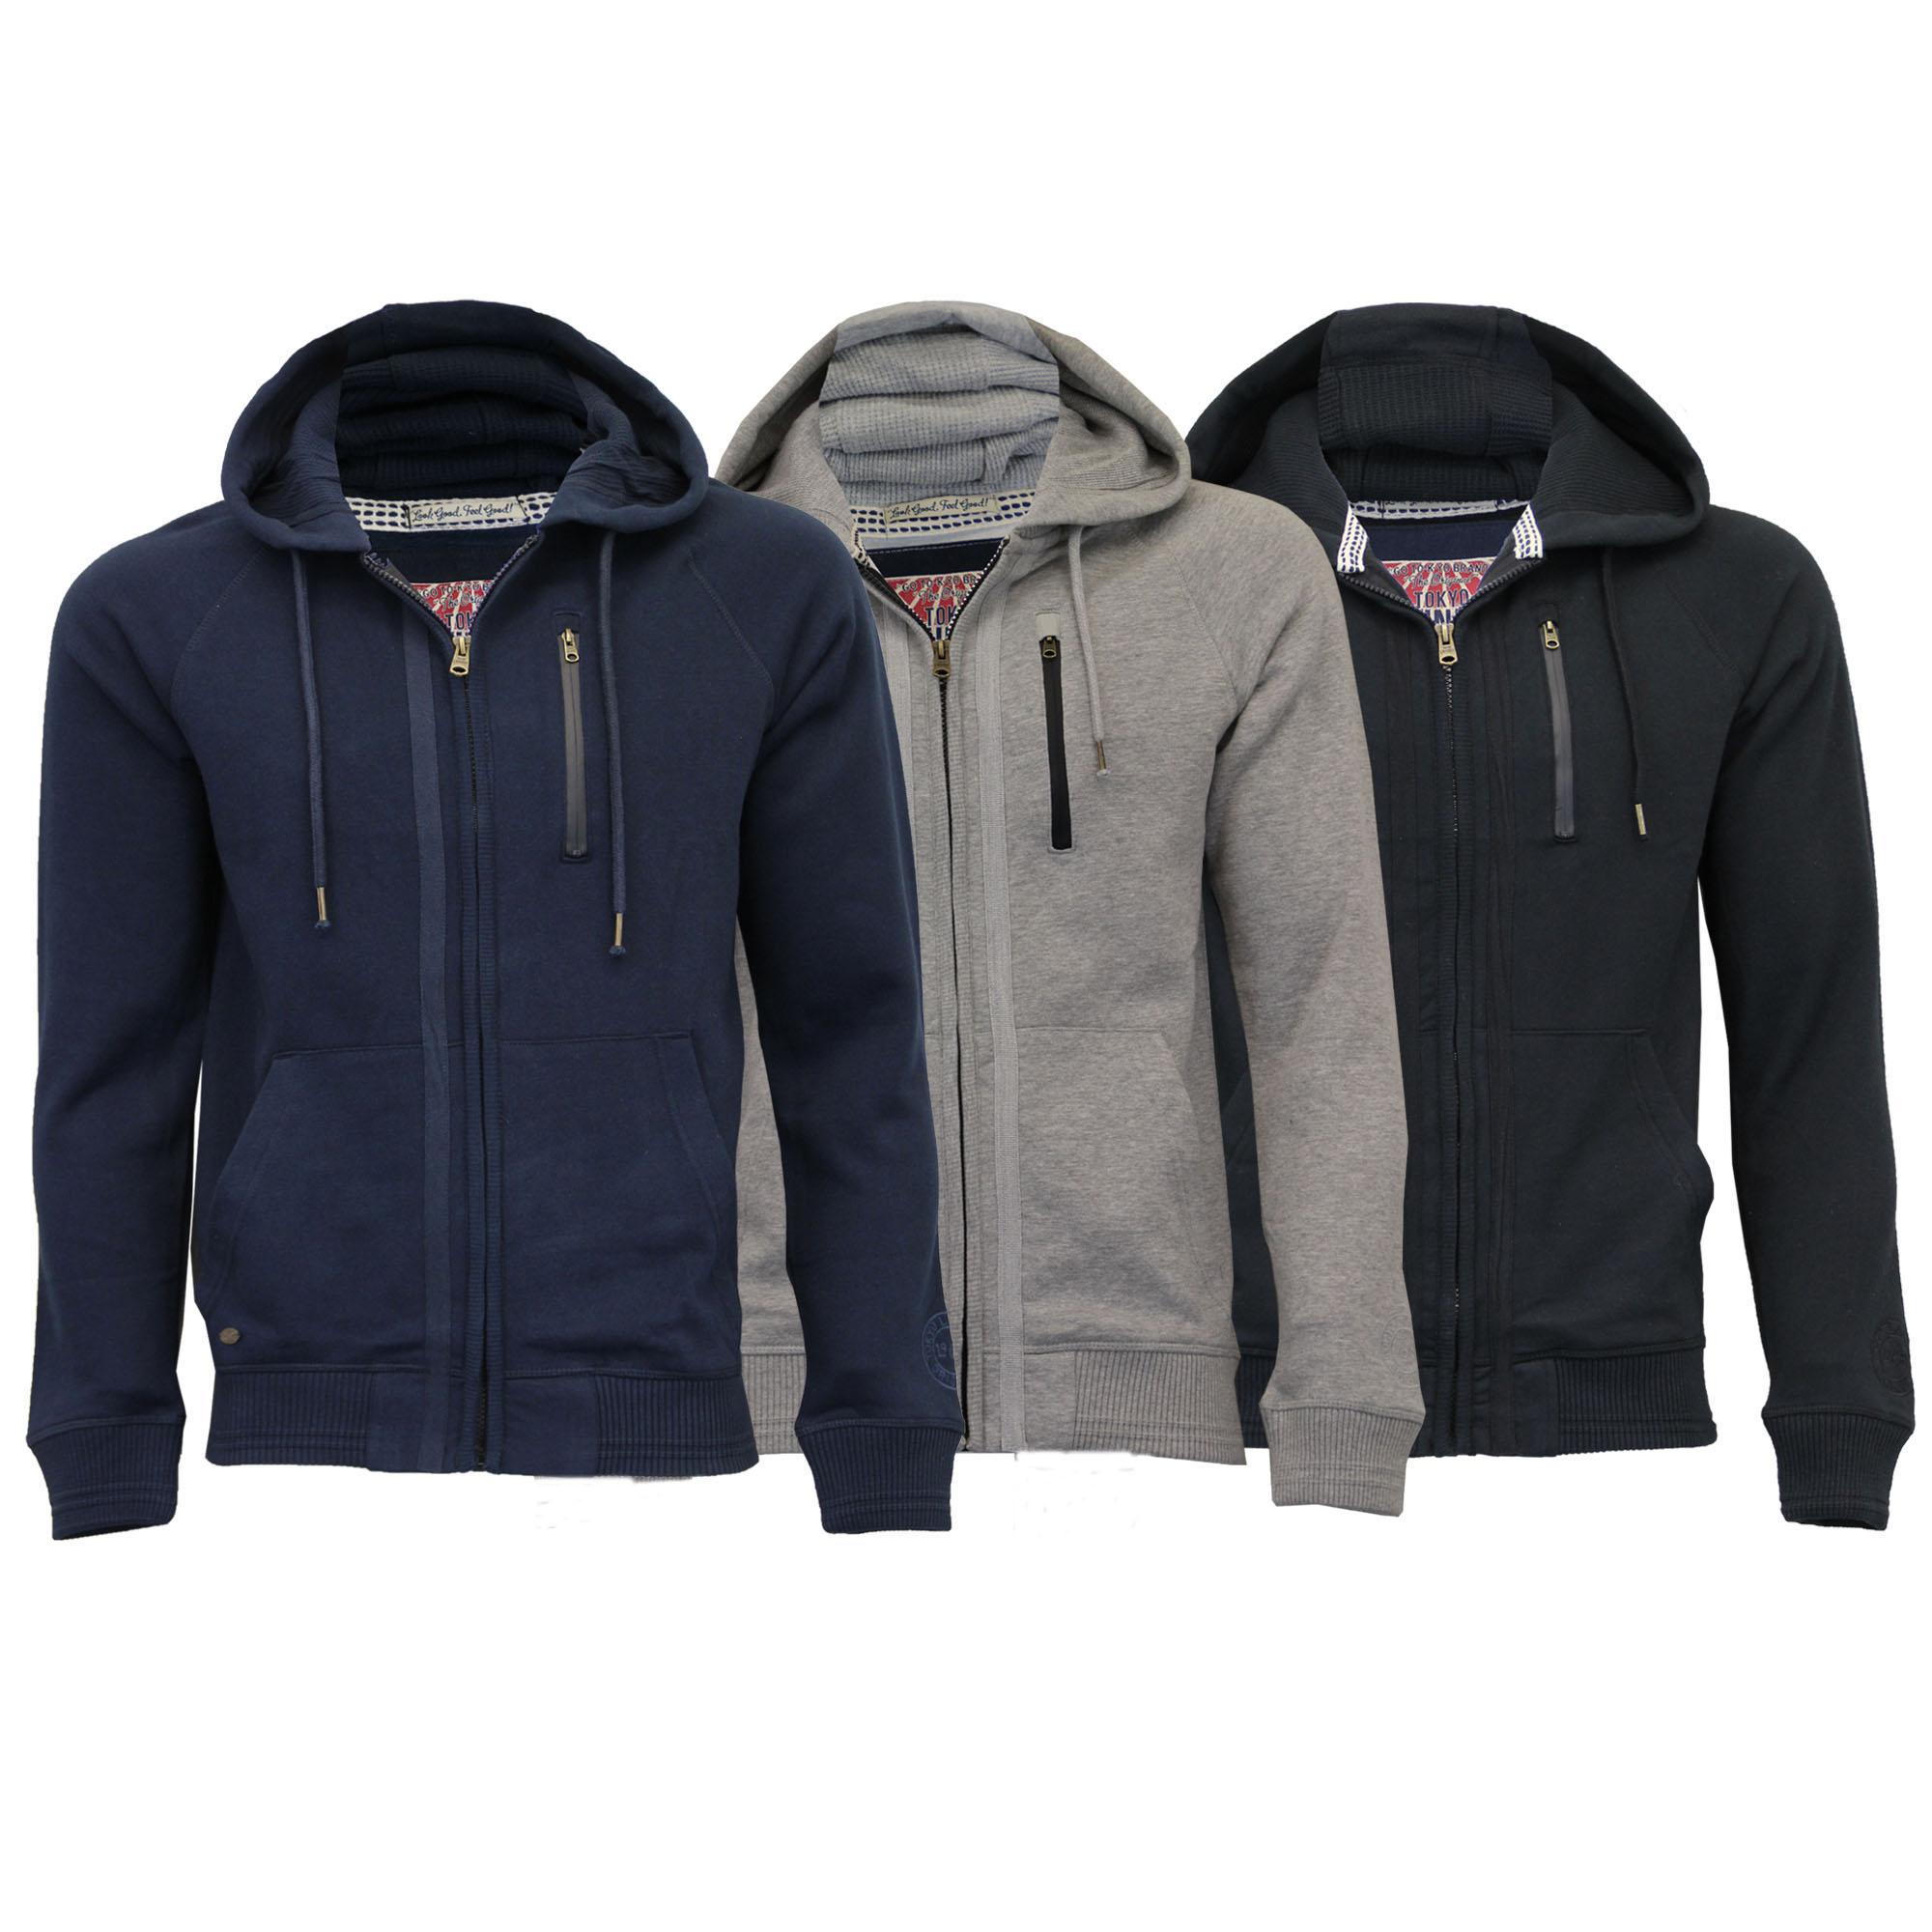 Mens-Sweatshirt-Tokyo-Laundry-Jacket-Hoodie-Top-Fleece-Lined-Casual-Winter-New thumbnail 5